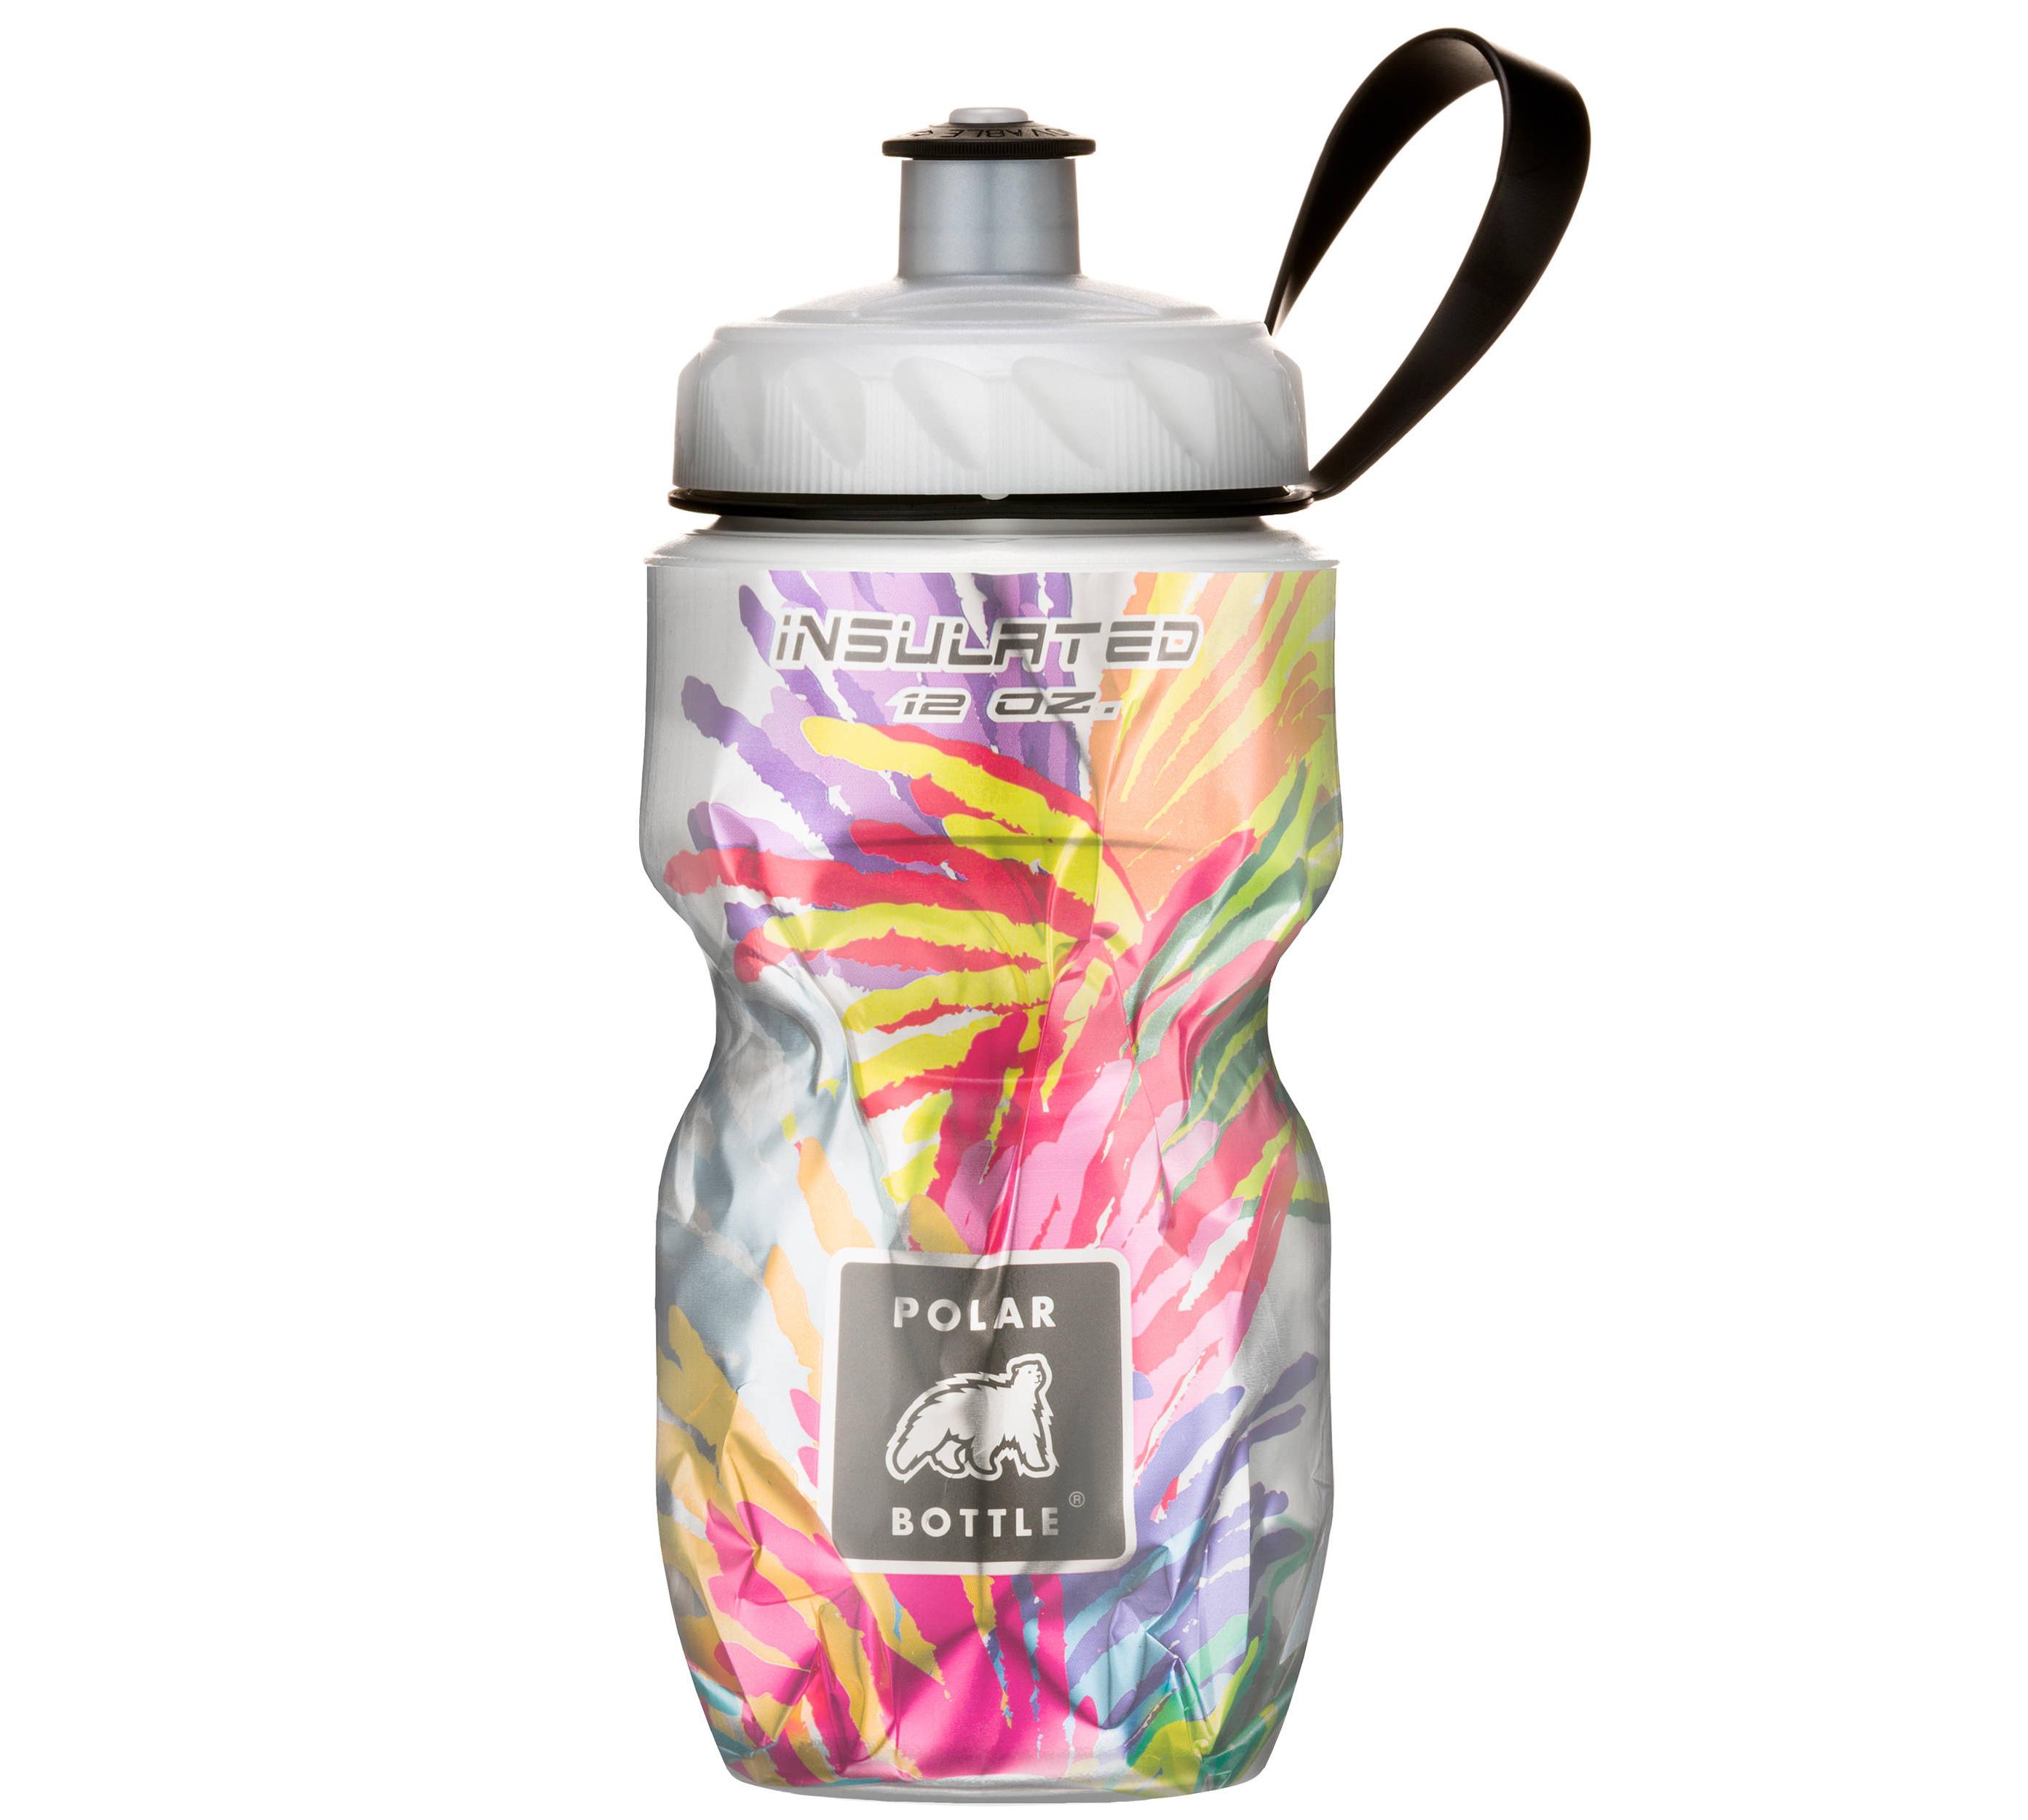 PB Insulated Bottle Starburst 12Oz